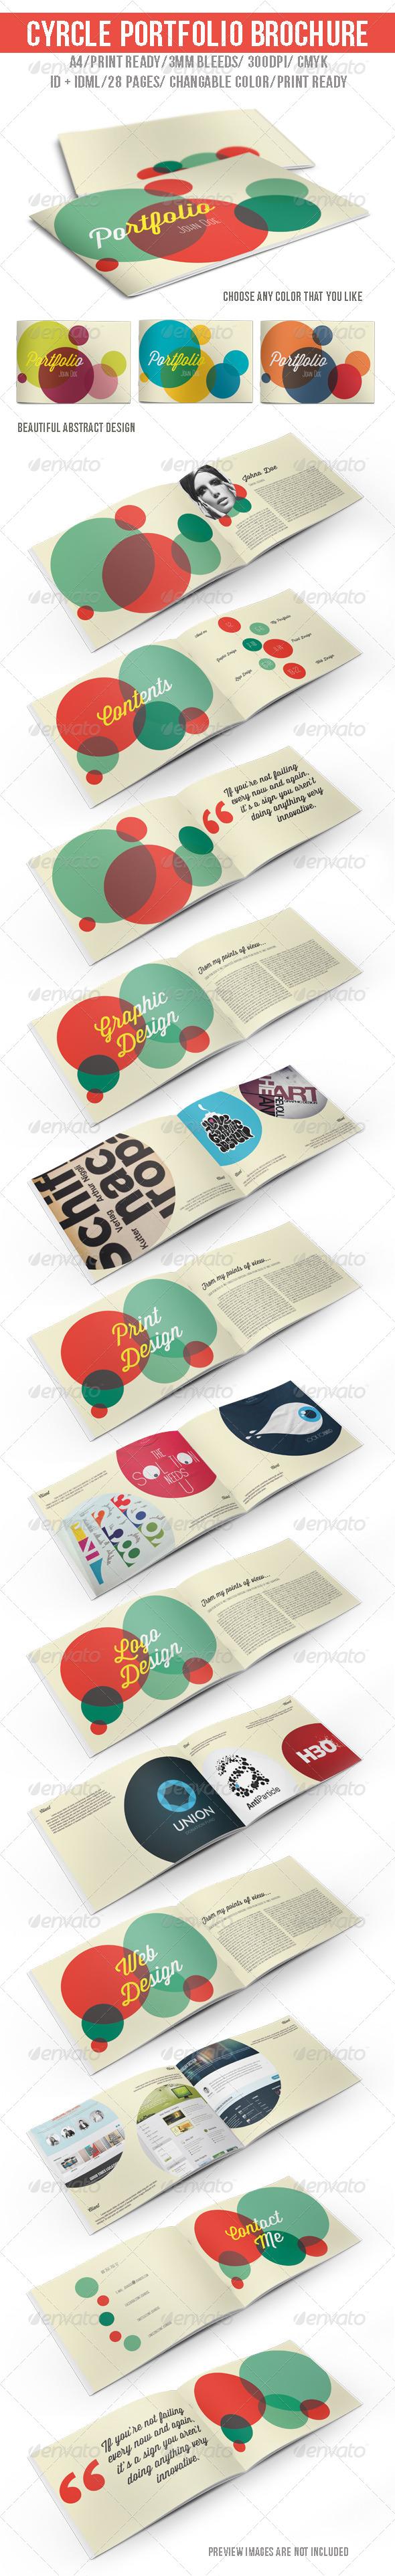 GraphicRiver Cyrcle Portfolio Brochure 6367285